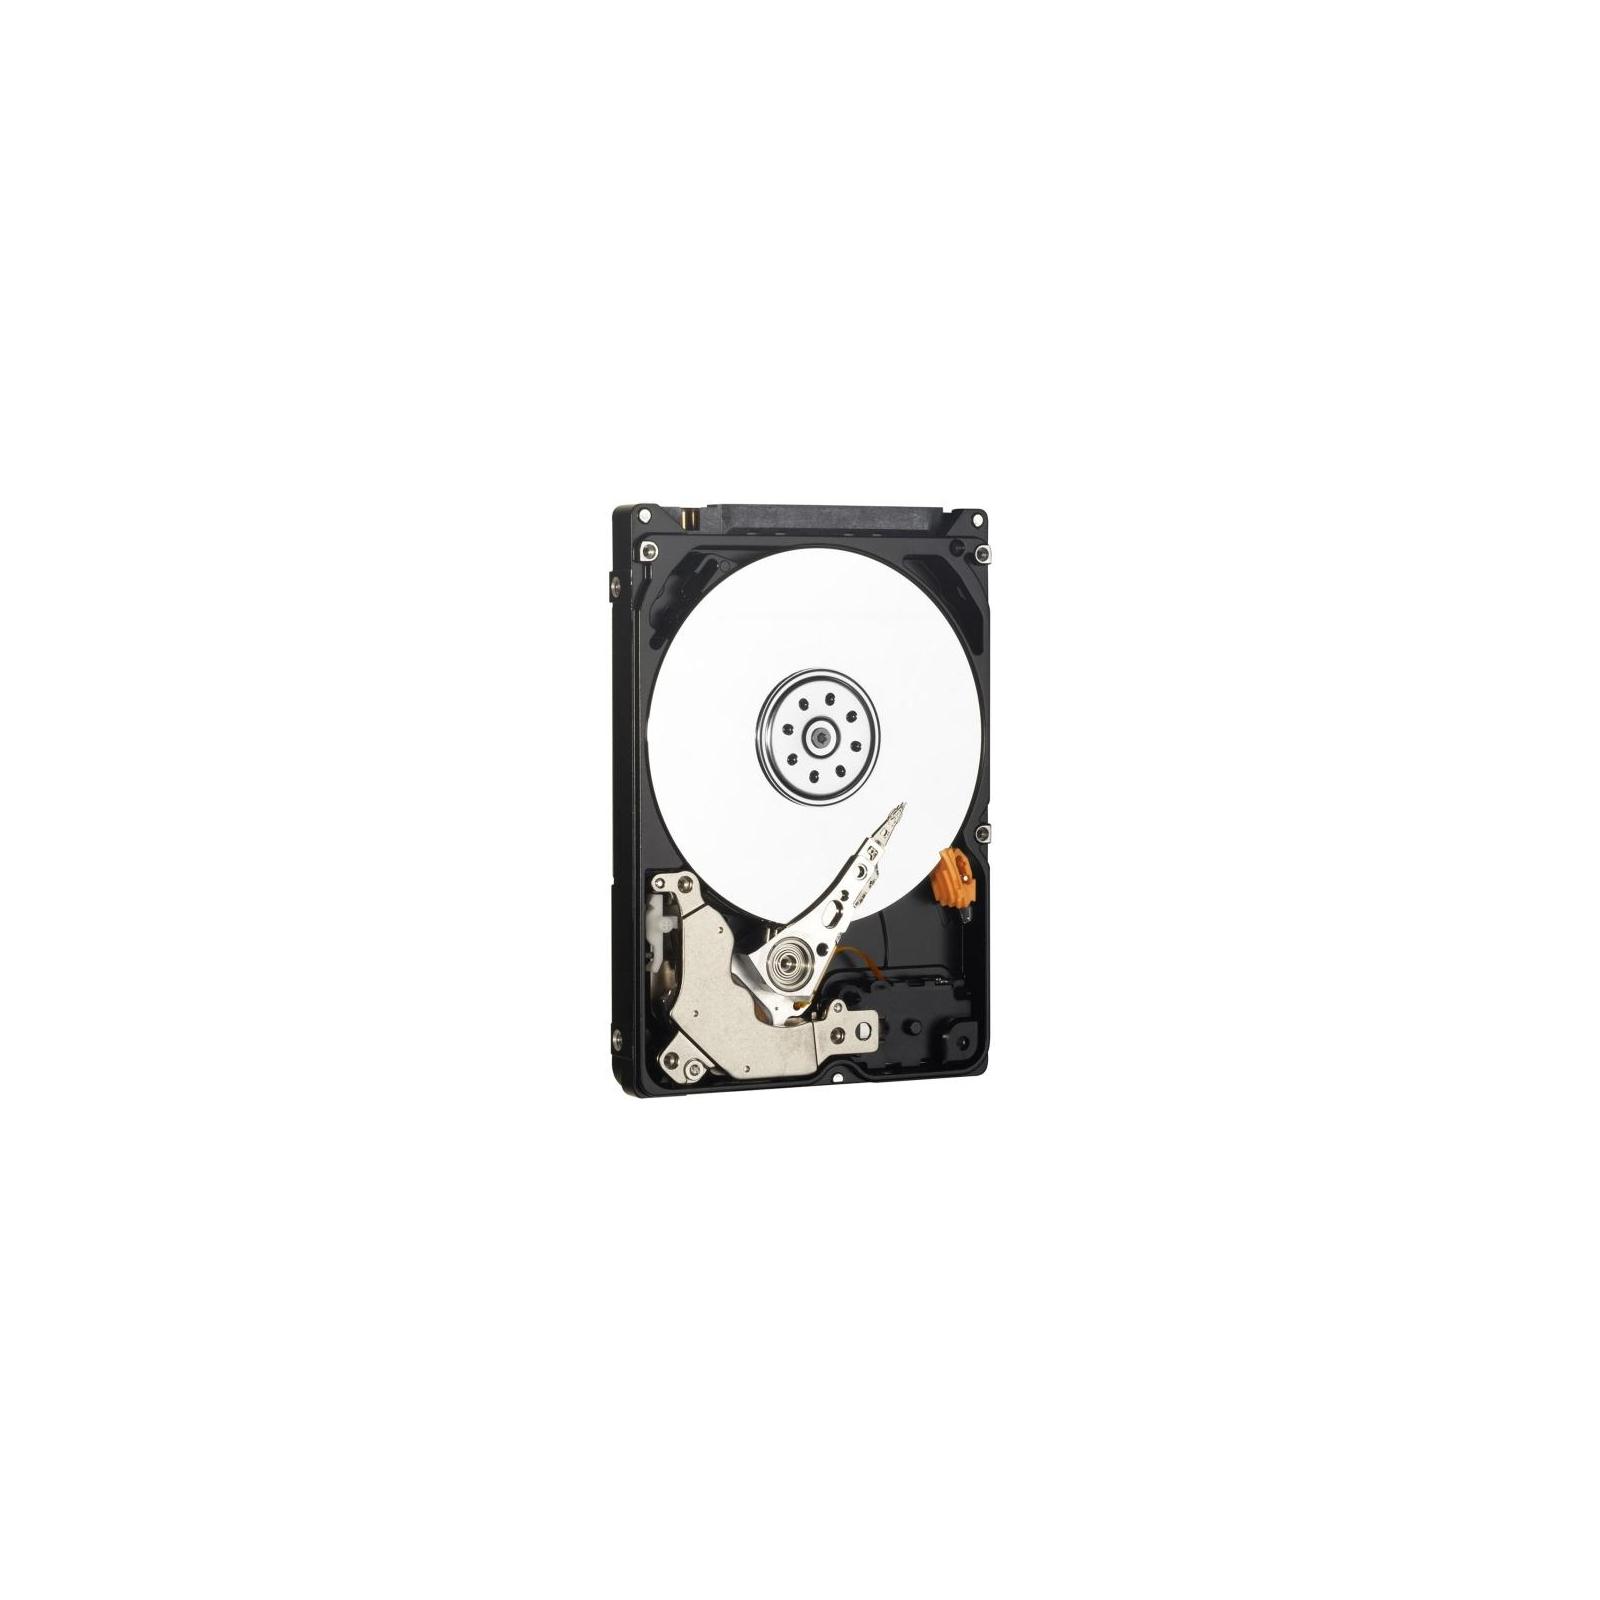 "Жесткий диск для ноутбука 2.5"" 1TB WD (#WD10JUCT-FR#) изображение 2"